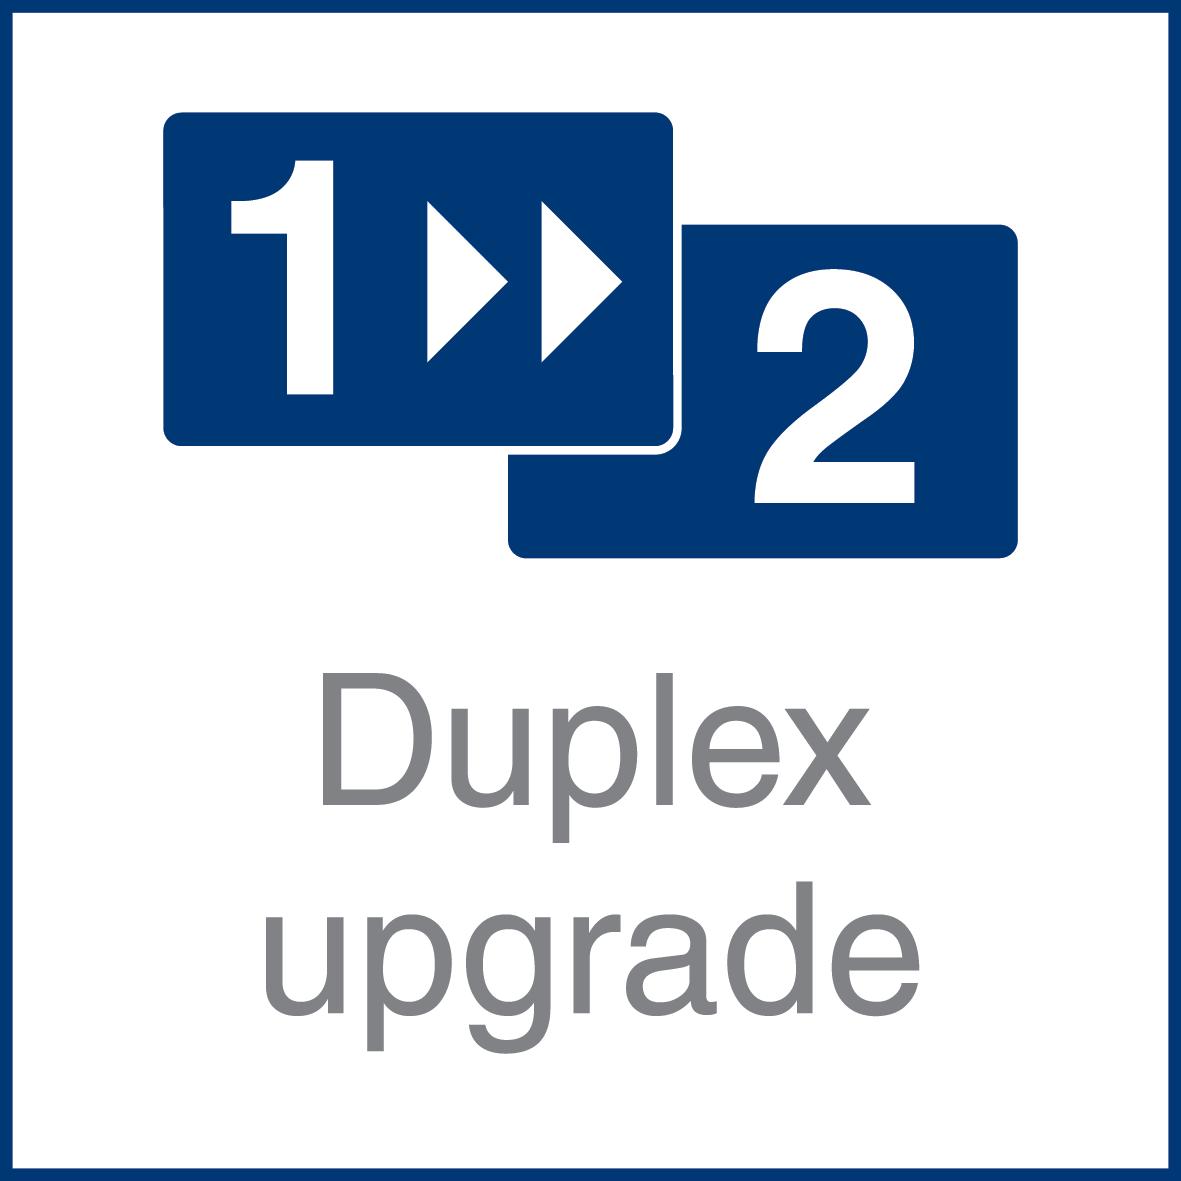 Duplex upgrade icon